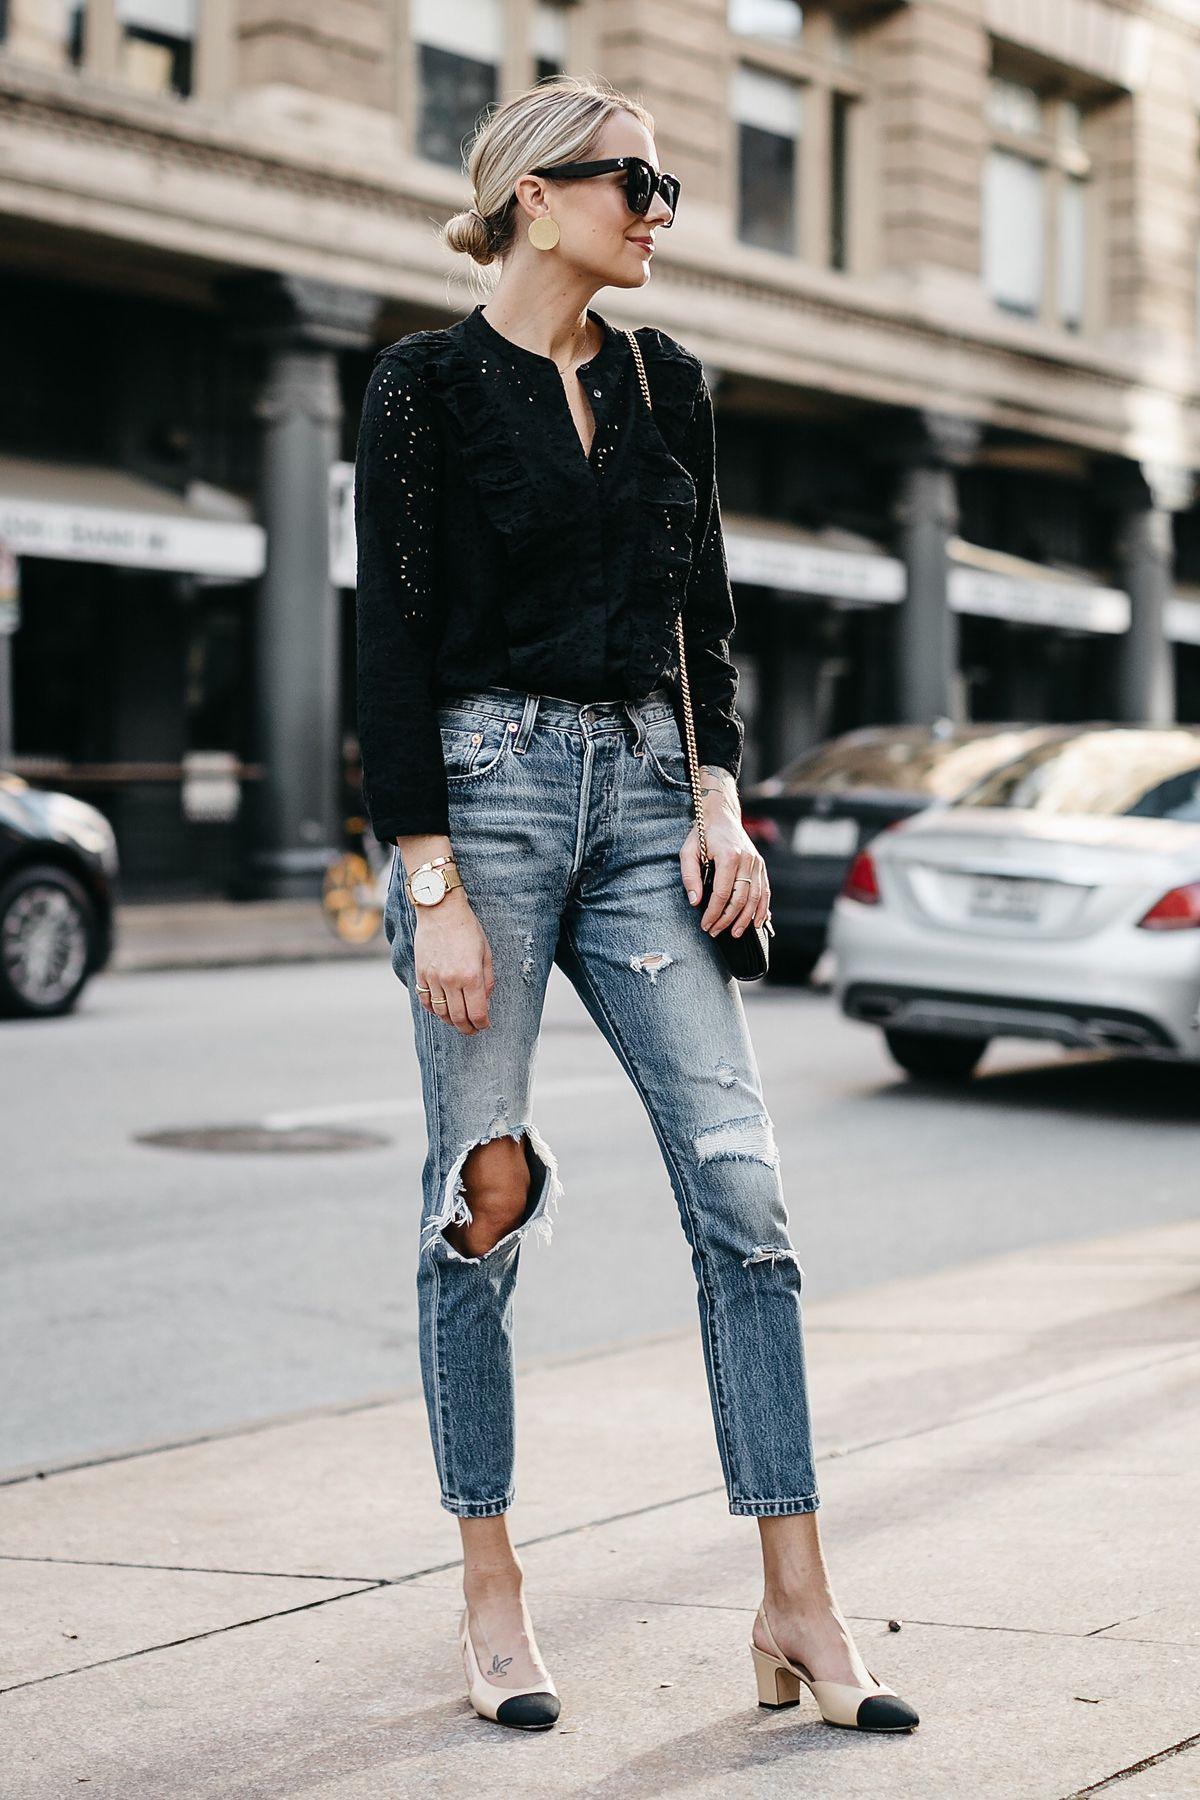 ef869942 Blonde Woman Wearing Madewell Black Eyelet Blouse Levis Denim Ripped Skinny  Jeans Chanel Slingbacks Fashion Jackson Dallas Blogger Fashion Blogger  Street ...